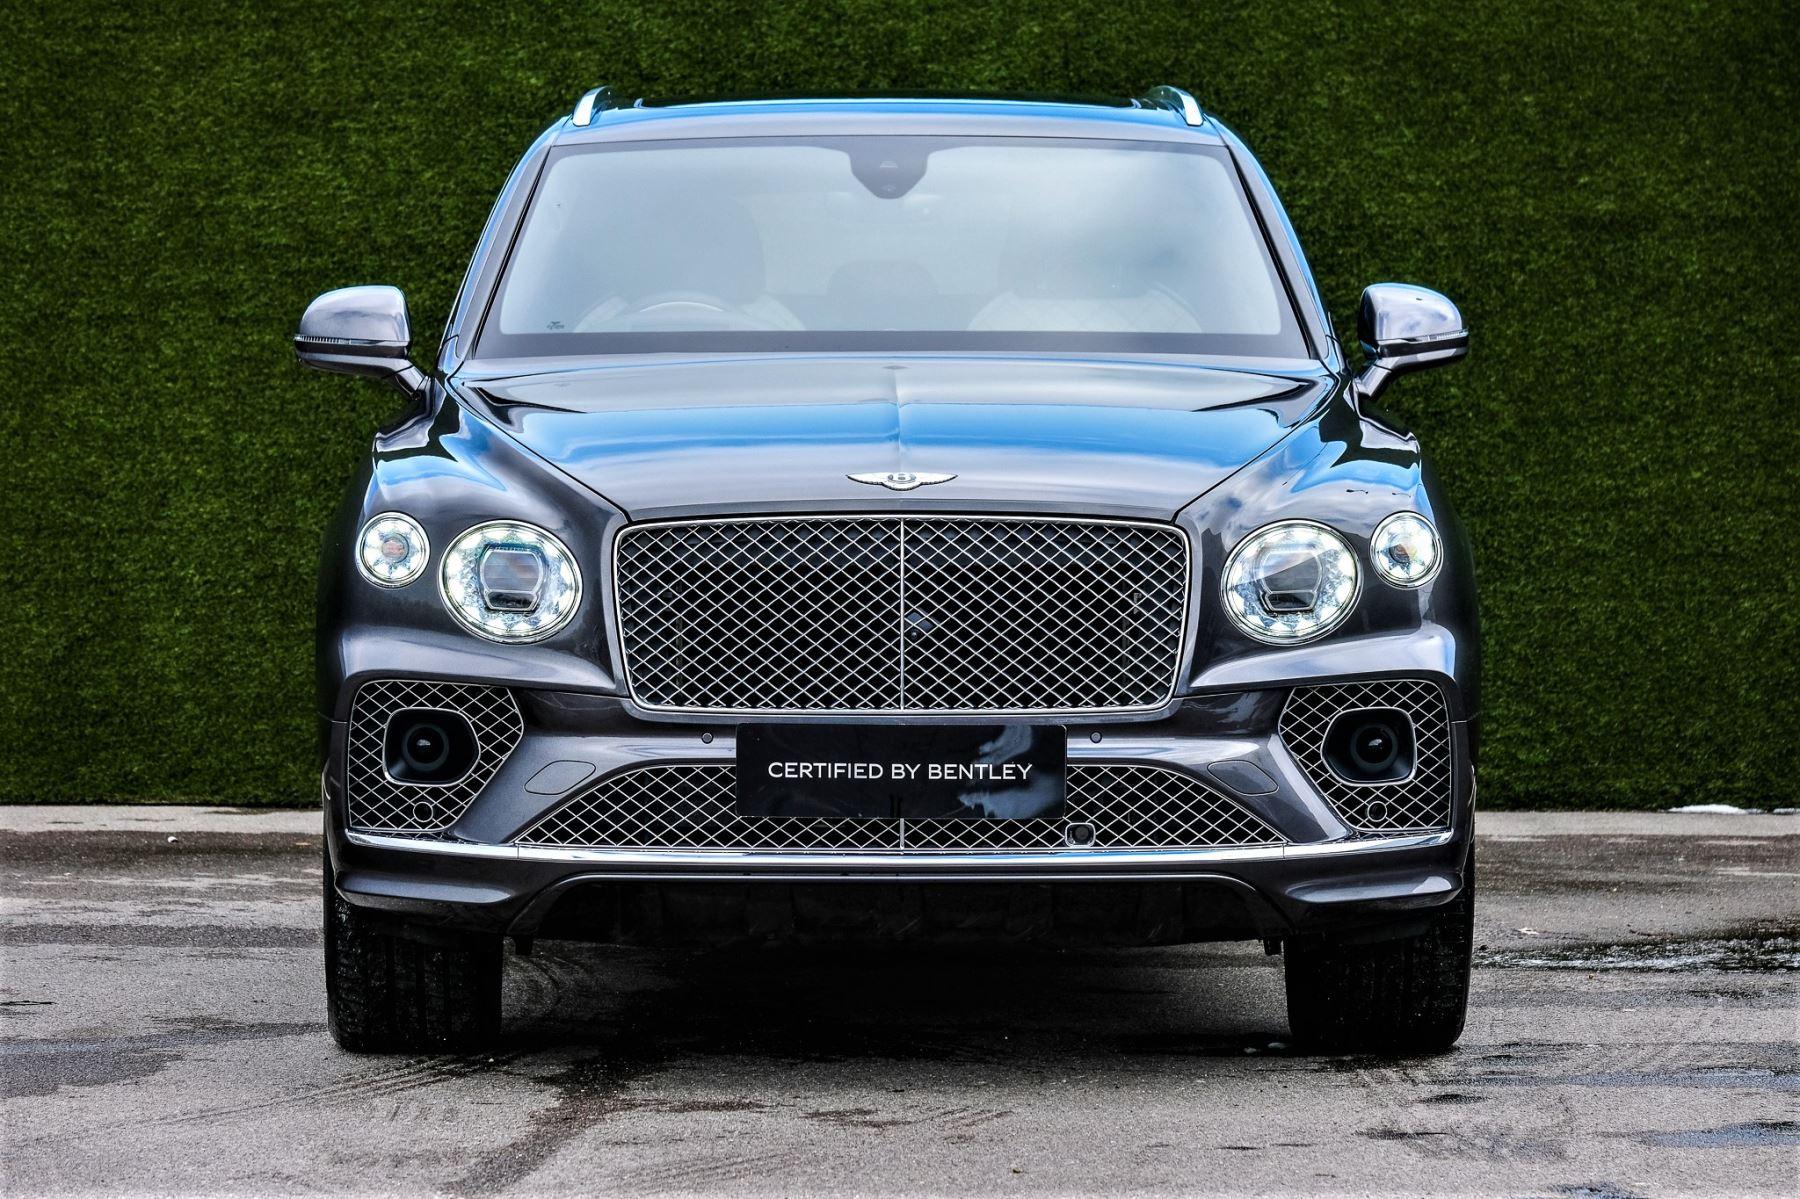 Bentley Bentayga First Edition 4.0 V8  image 2